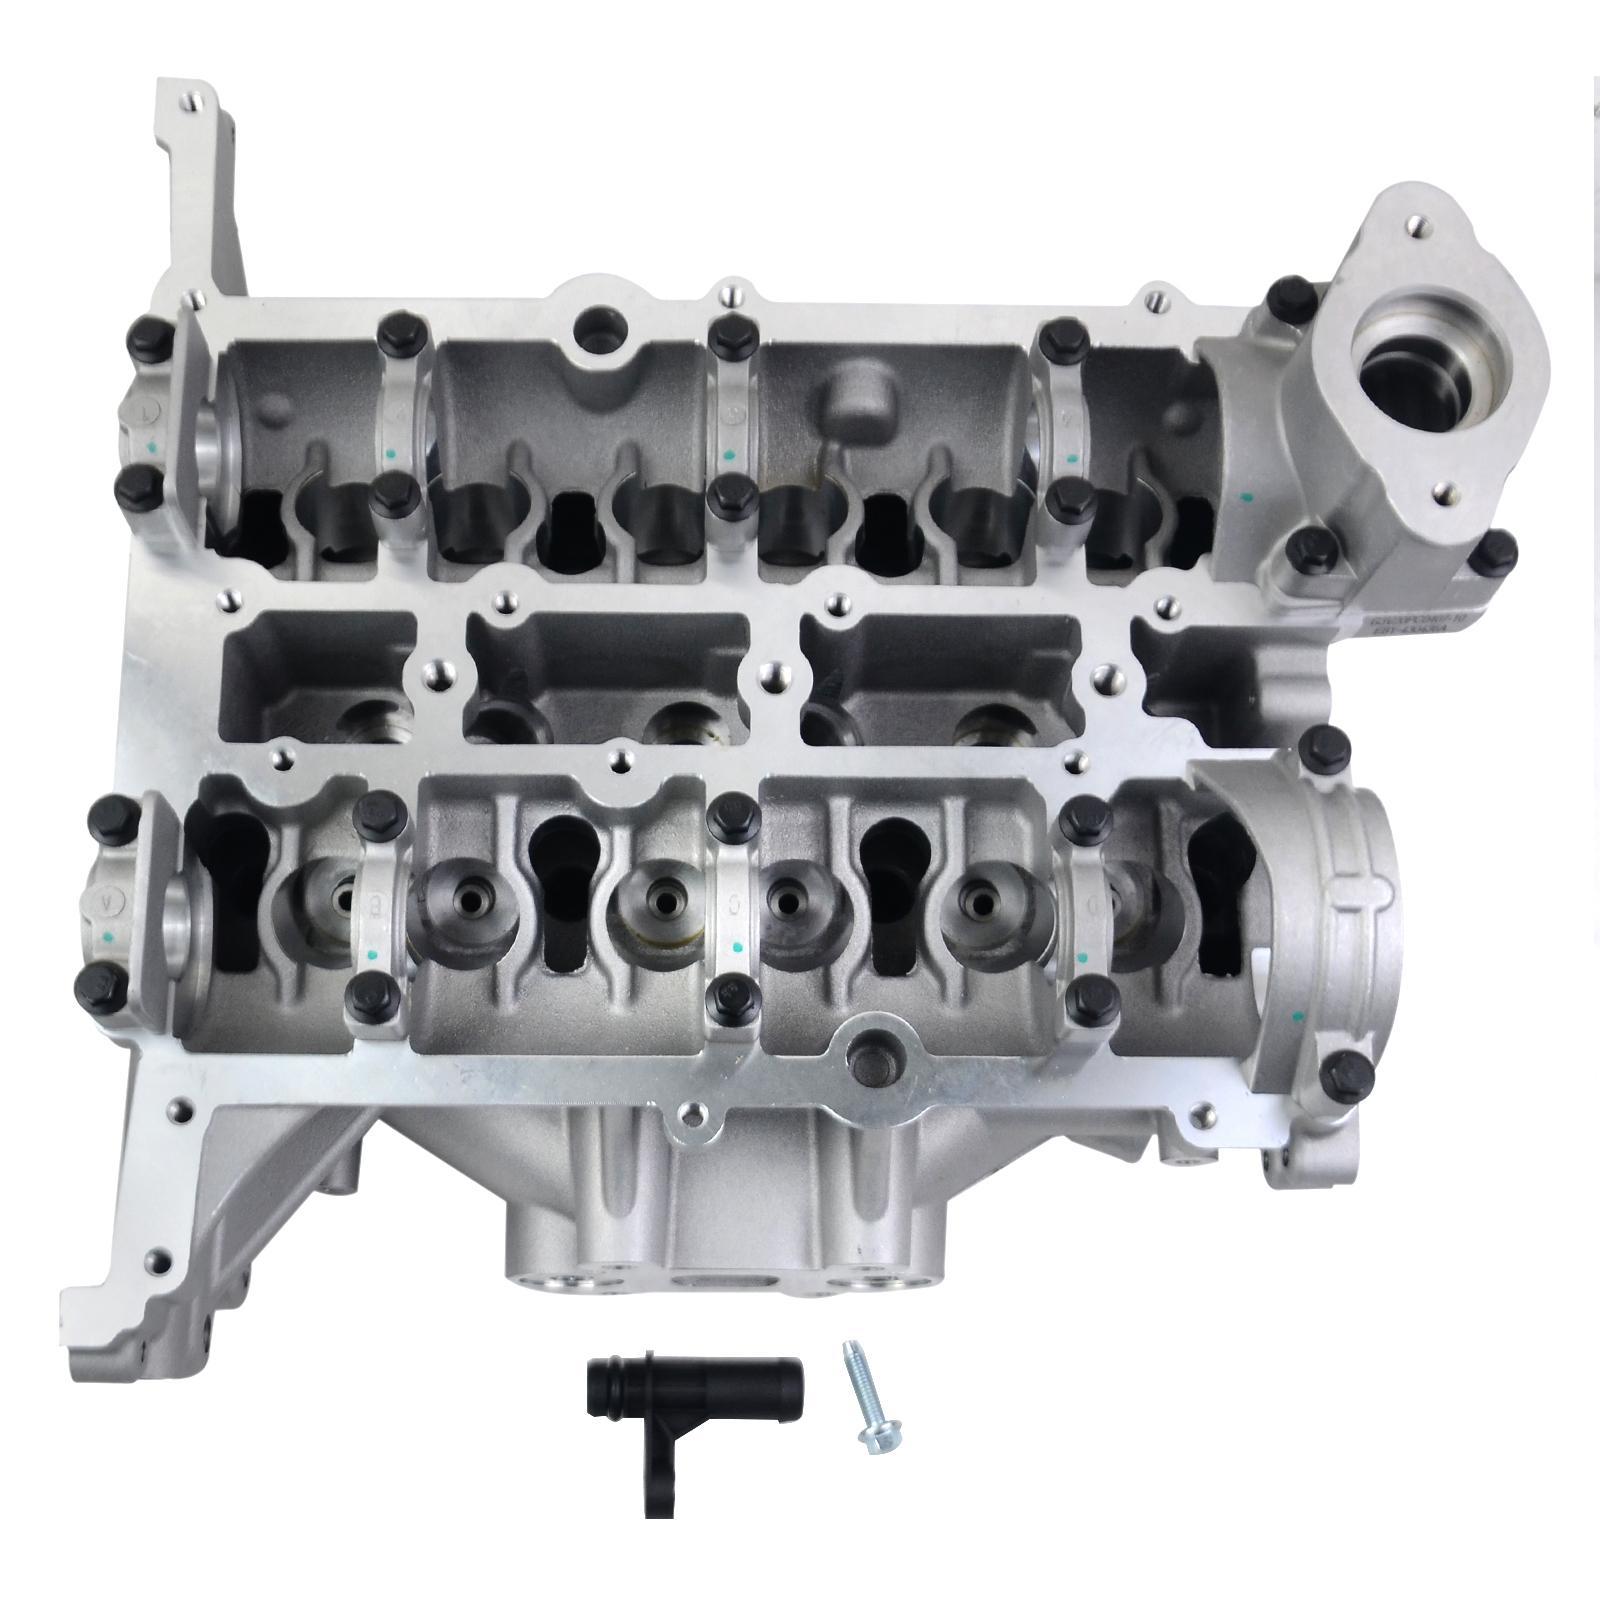 AP03 1857524 البنزين الاسطوانة لفورد التركيز فييستا العبور B-MAX C-MAX 1,0 معارض السيارات CM5G6C032CB